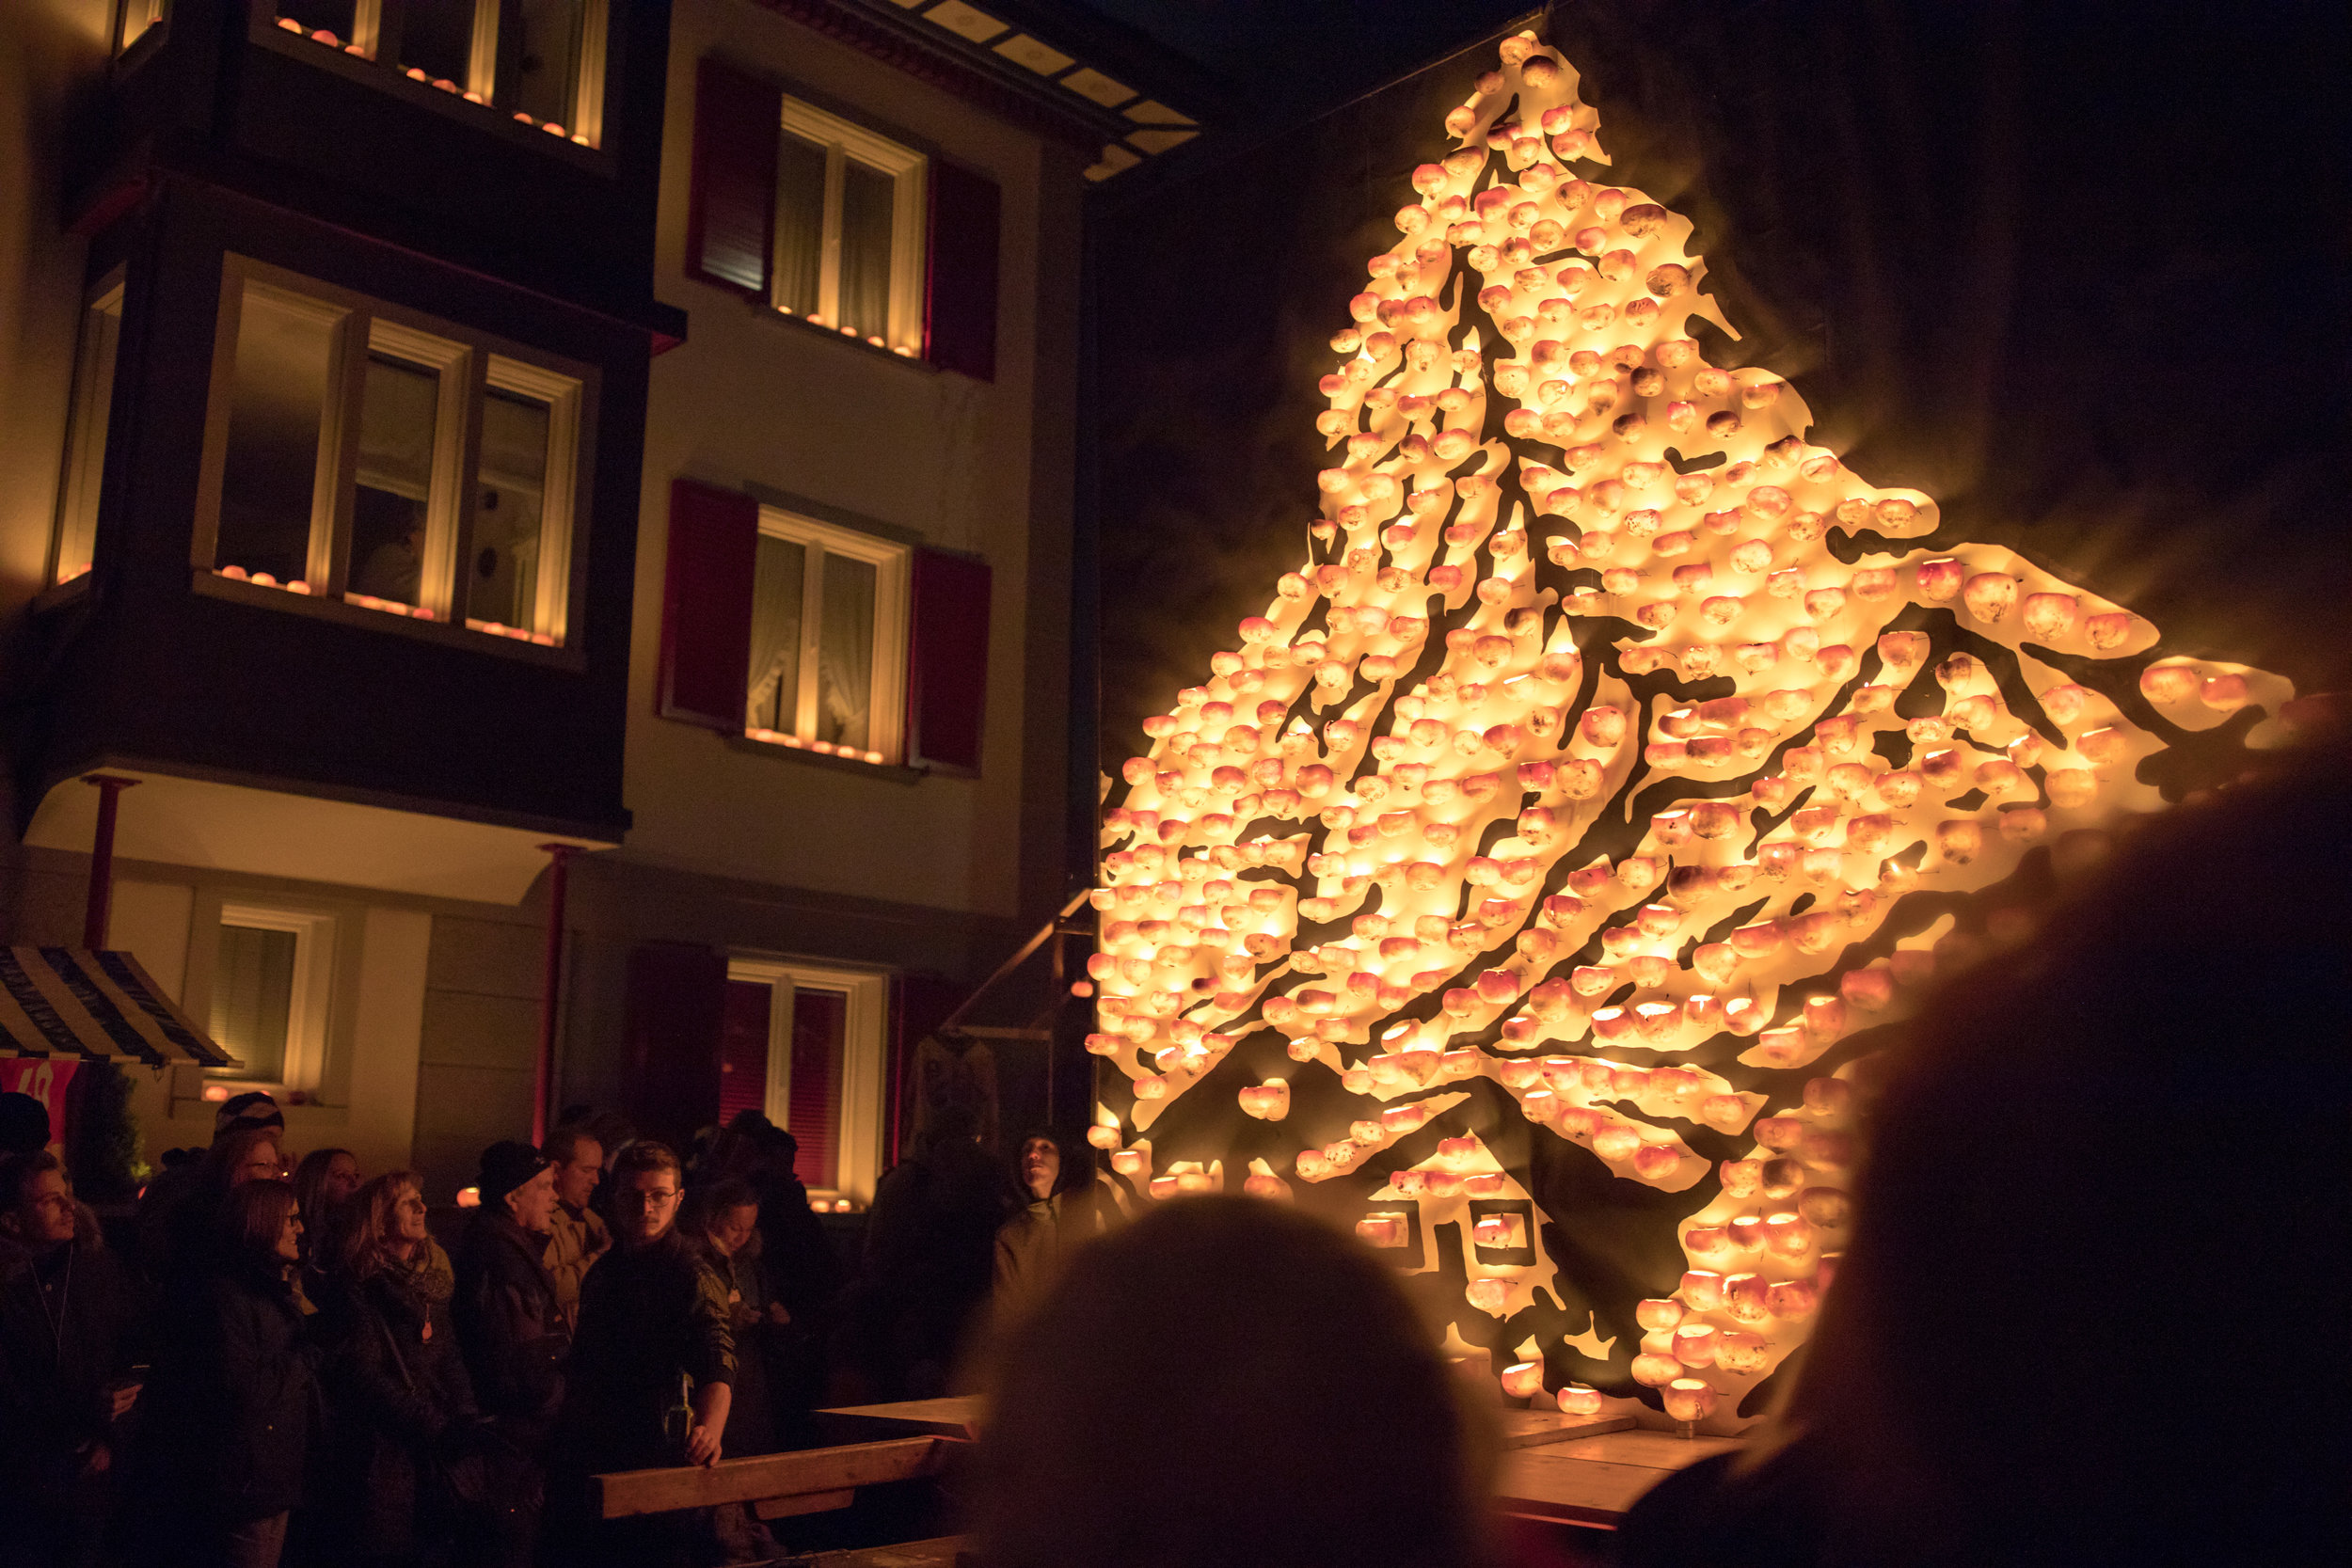 turnip-festival-parade-cmatterhorn-richterswil-switzerland.jpg.jpg